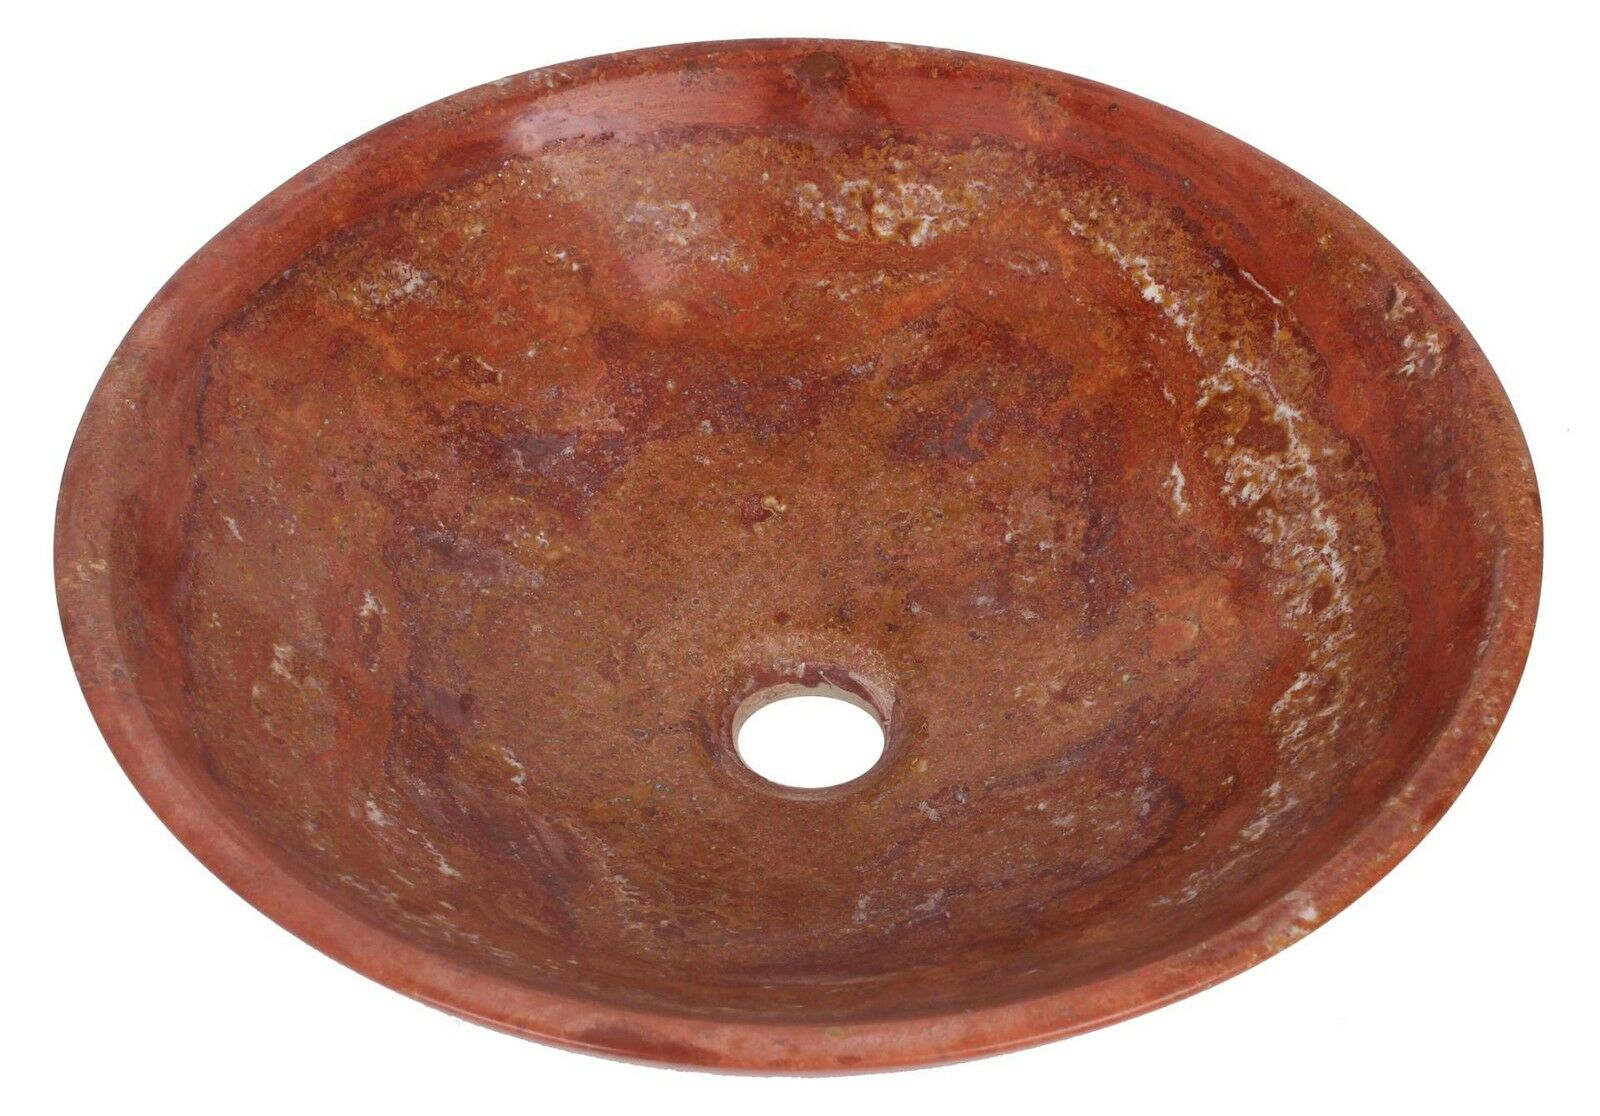 Travertin marbre rond bol salle de bains de lavabo diamètre 300mm B0065